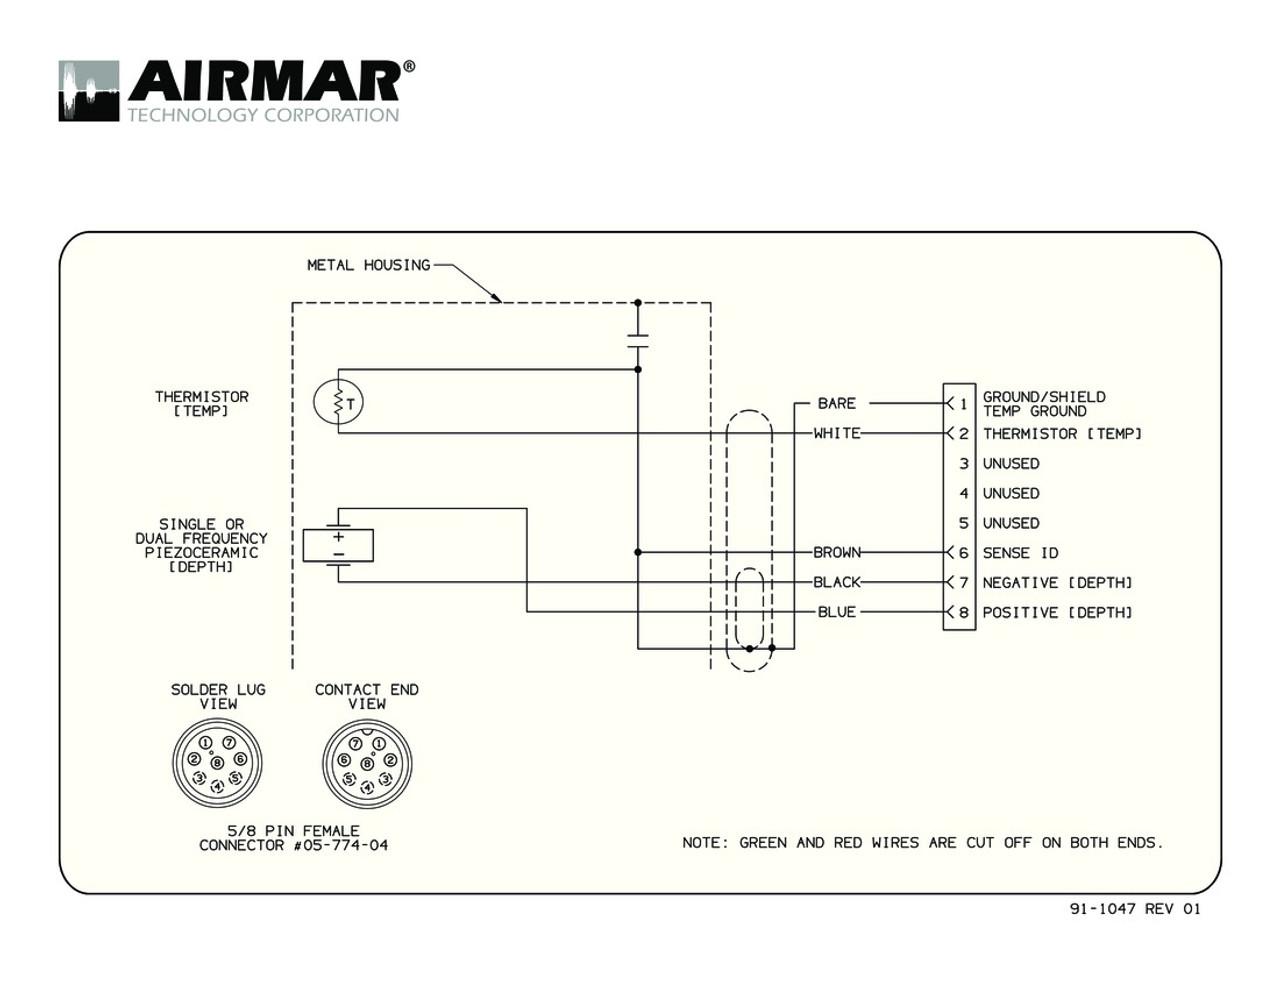 hight resolution of garmin power wiring diagram wiring libraryairmar wiring diagram garmin b117 8 pin d t